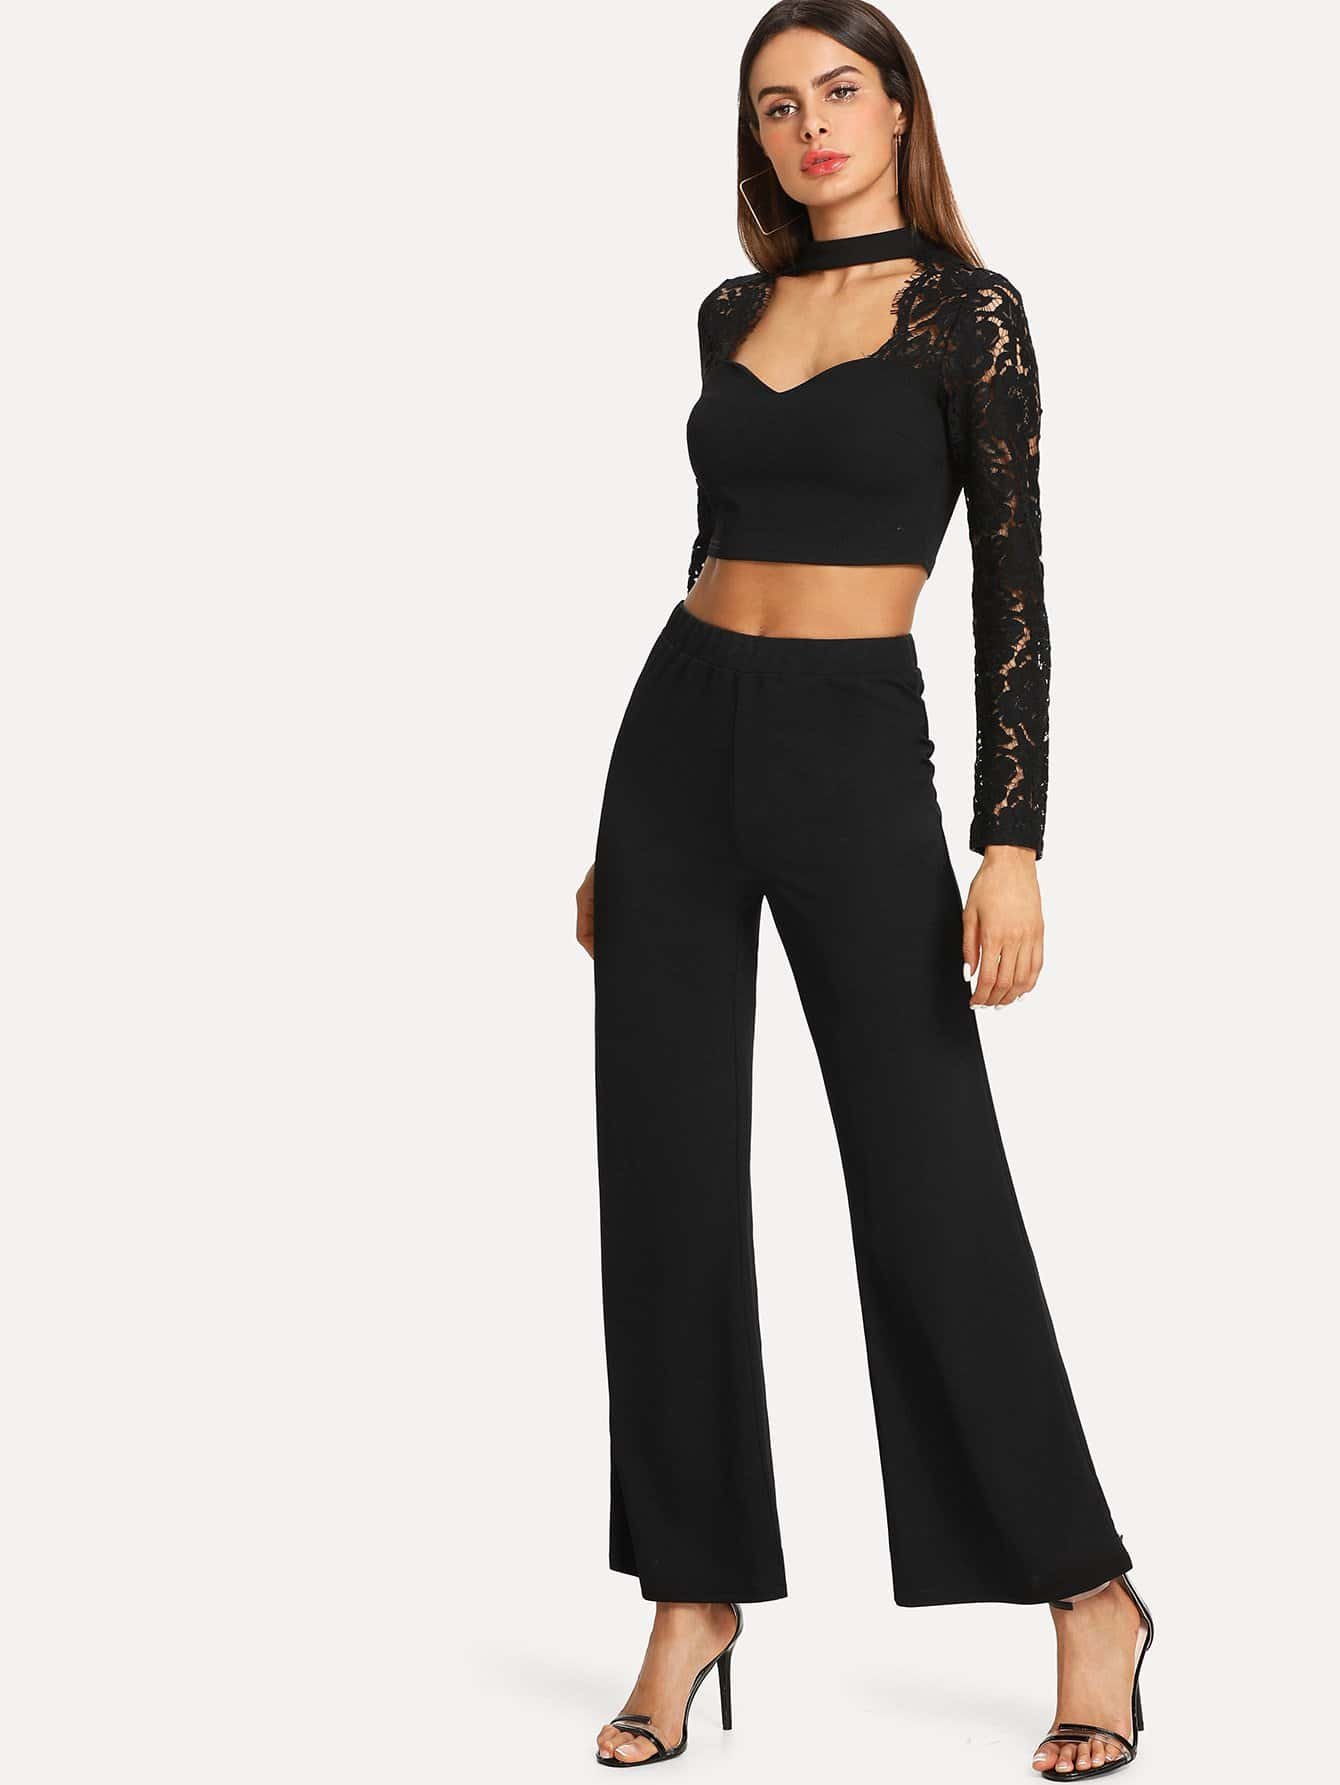 Фото Choker Neck Lace Panel Crop Top & Wide Leg Pants Set black choker sleeveless crop top